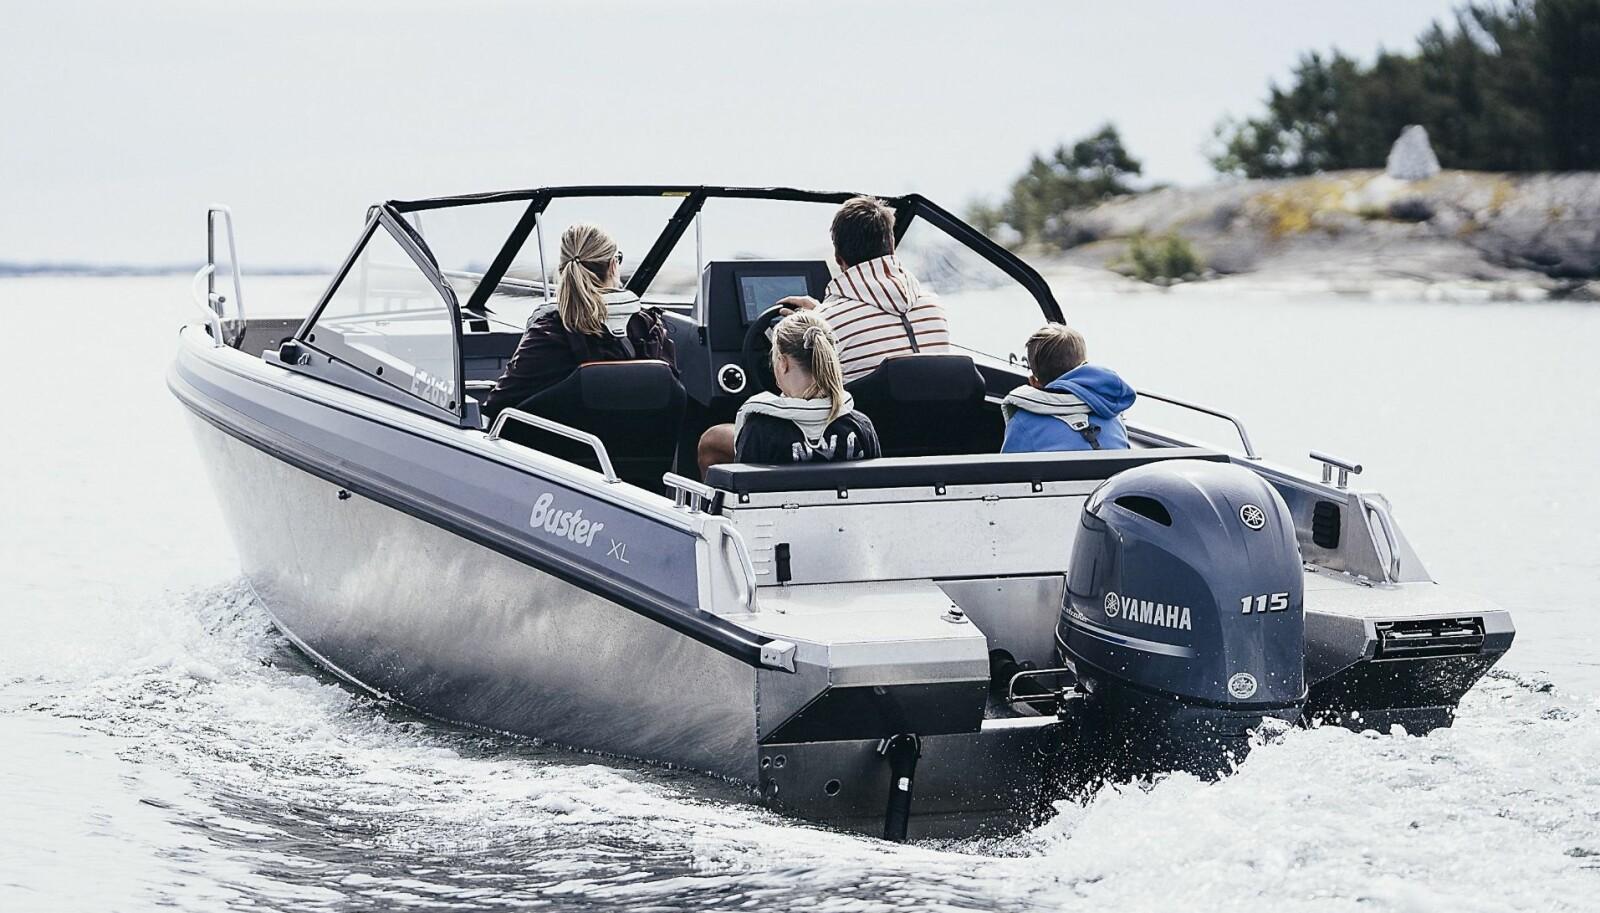 <b>BUSTER XL:</b> En røff aluminiumsbåt i seksmeters-klassen. En båttype som tiltaler mange nordmenn.